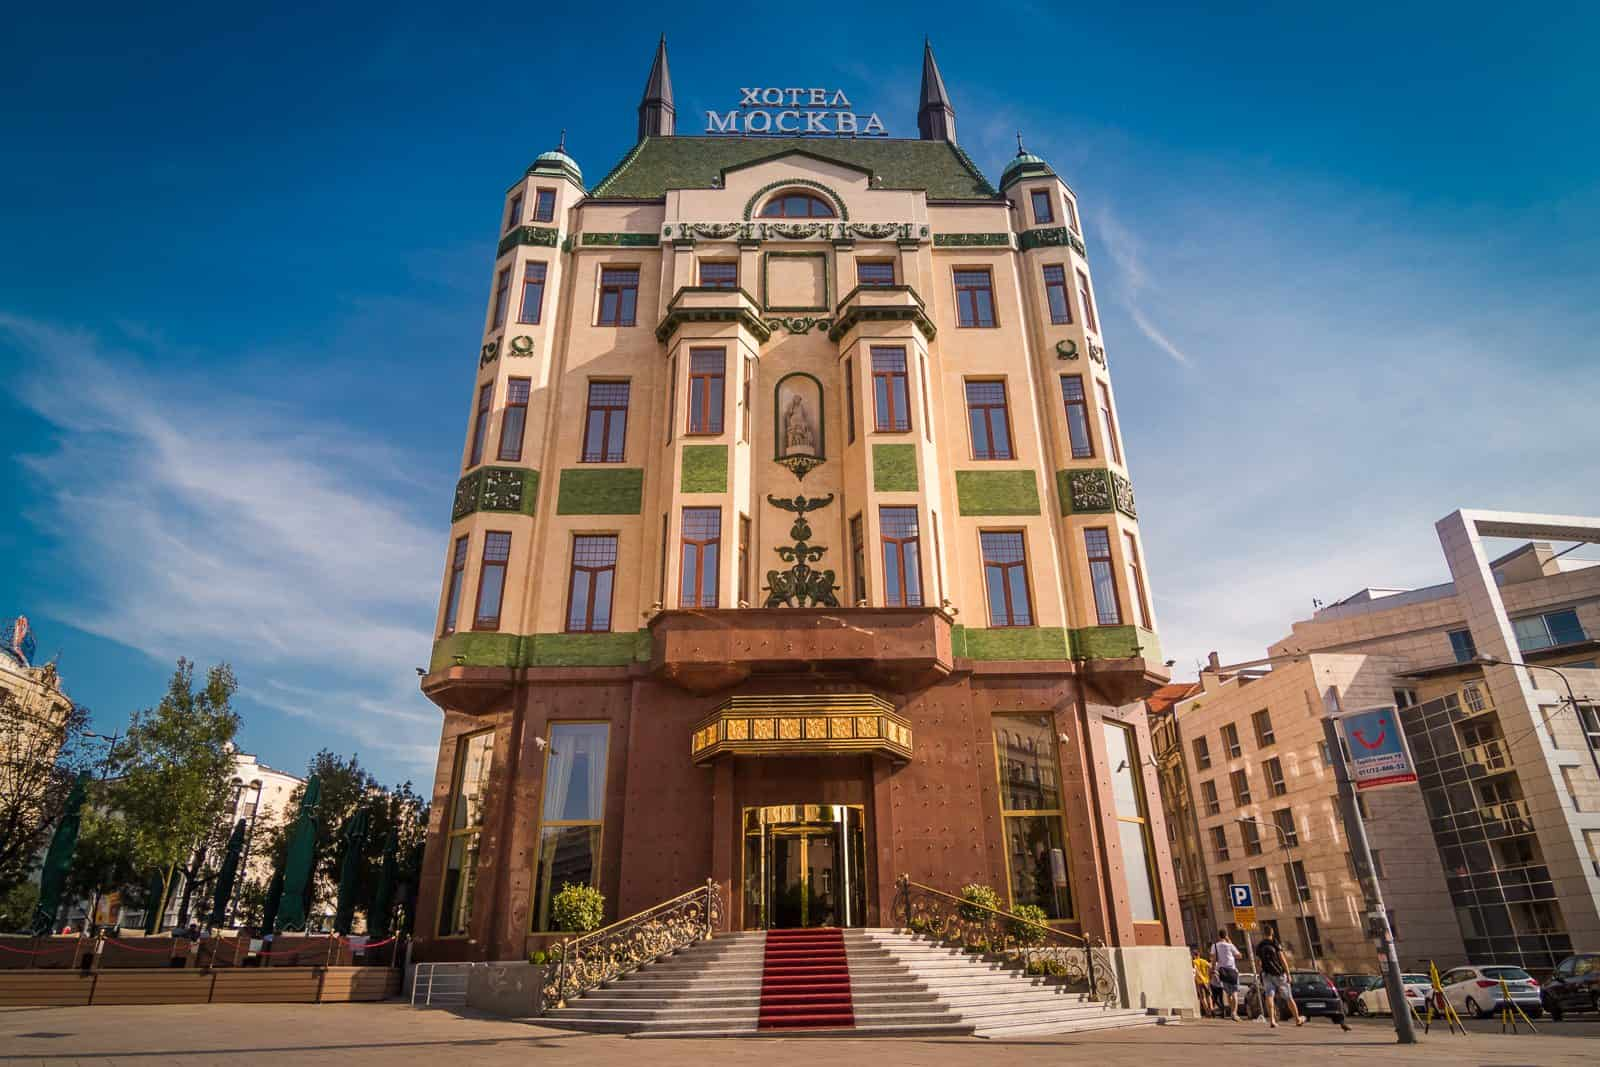 Interesting building in Belgrade, Serbia.